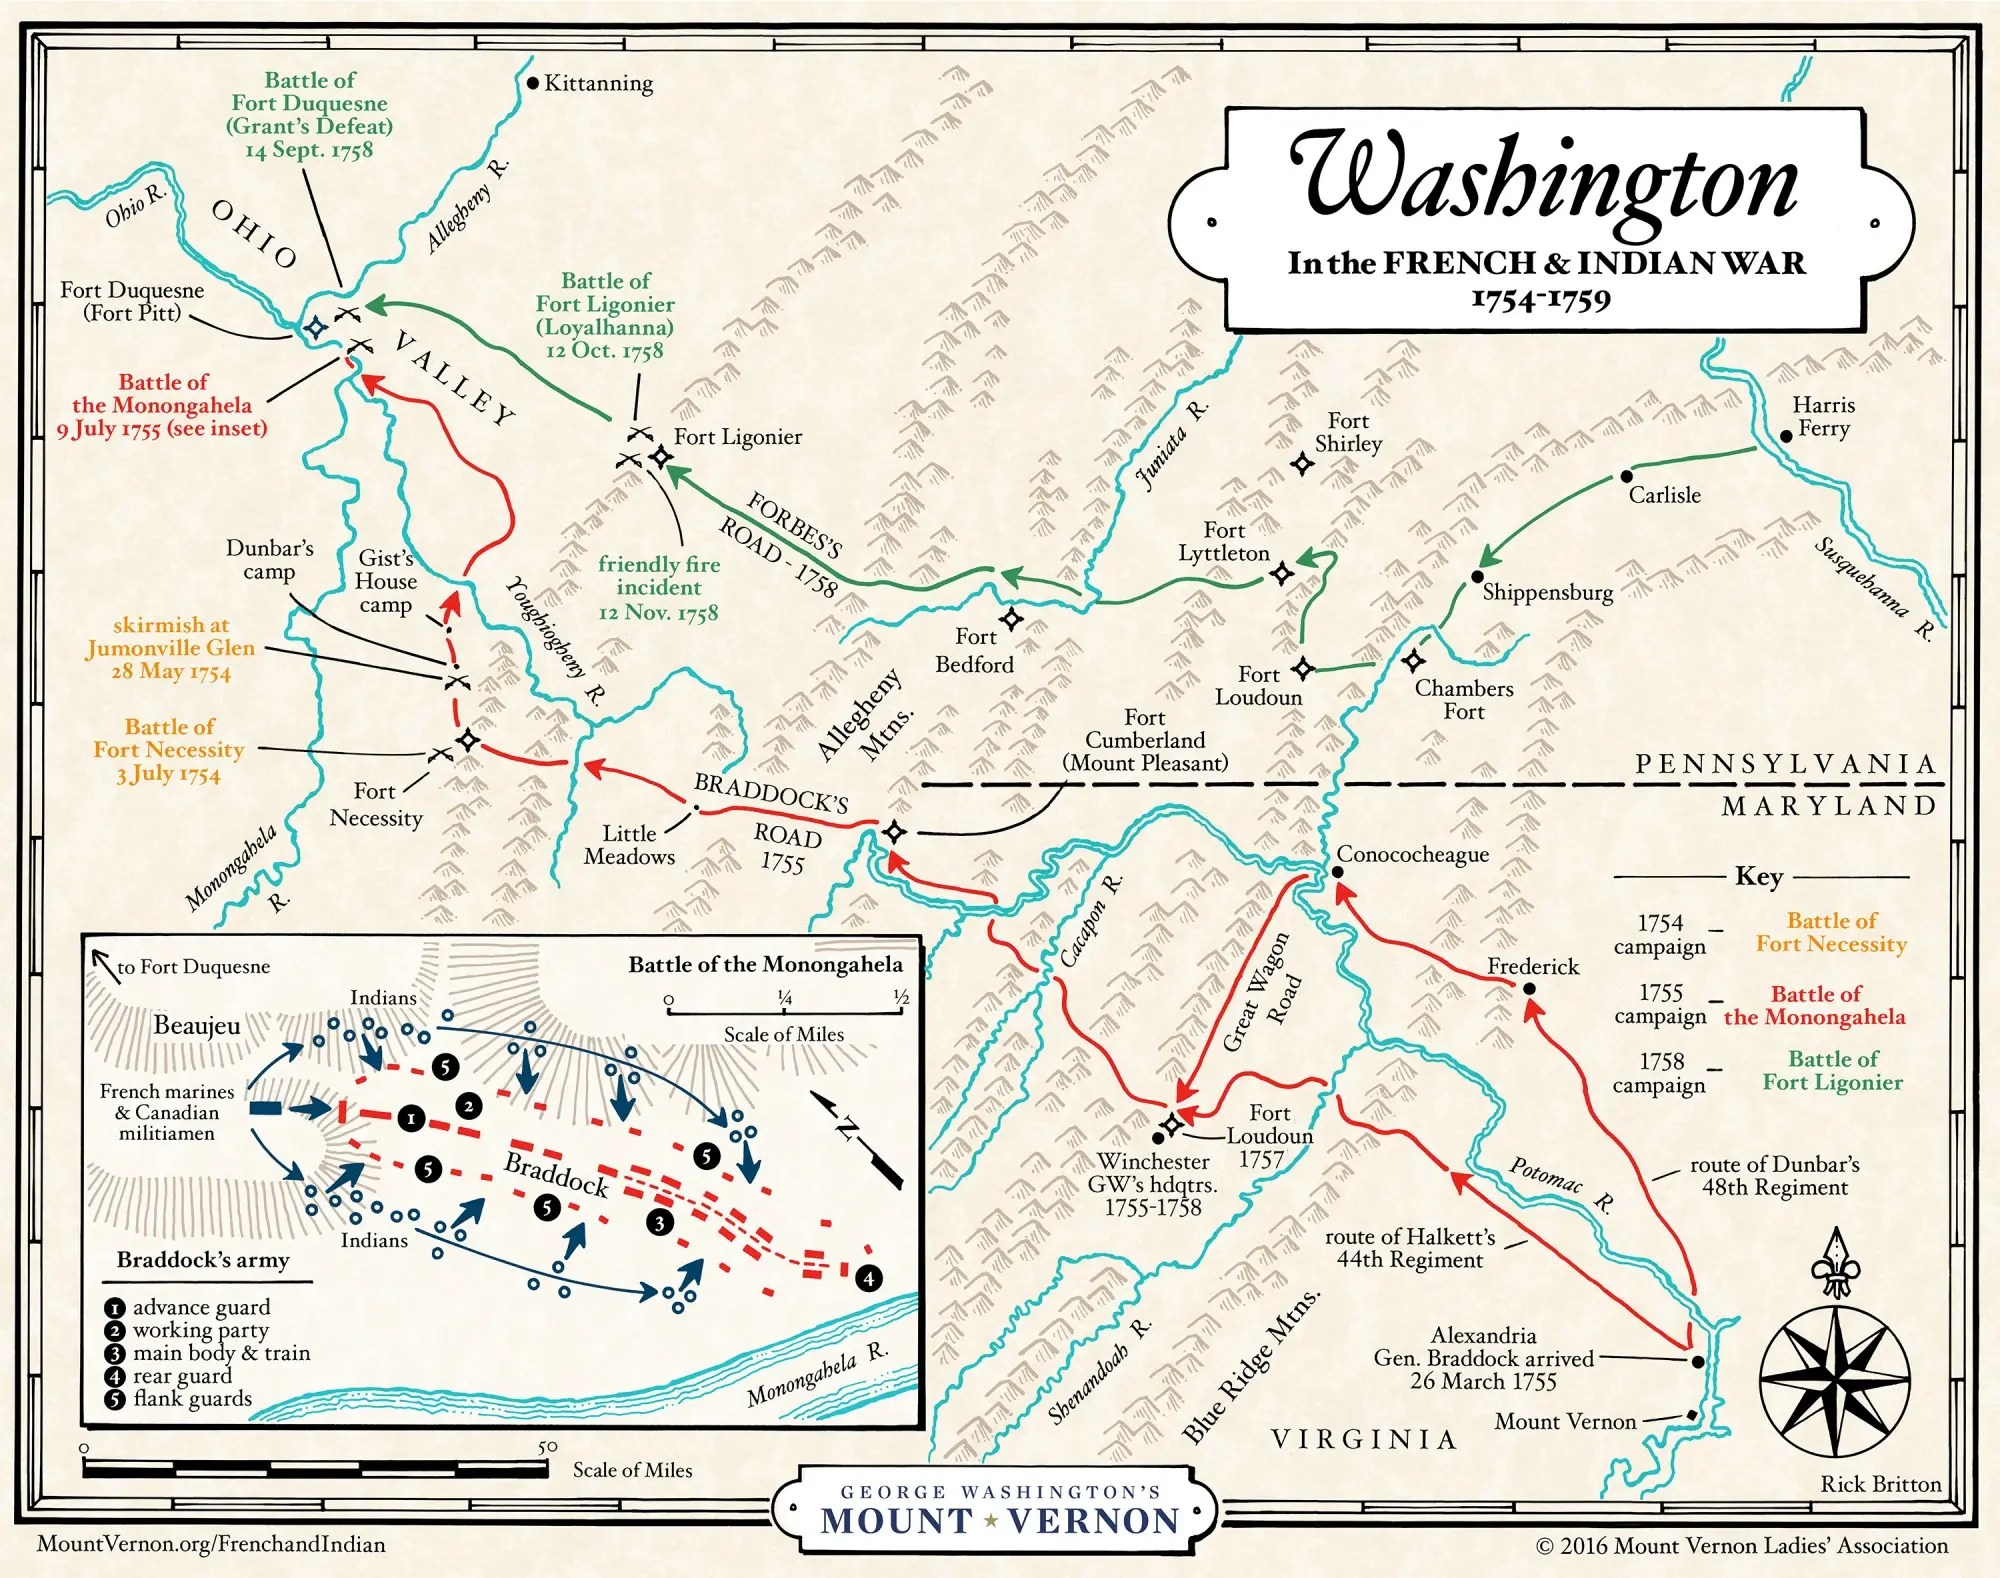 Washington In The French Amp Indian War George Washington